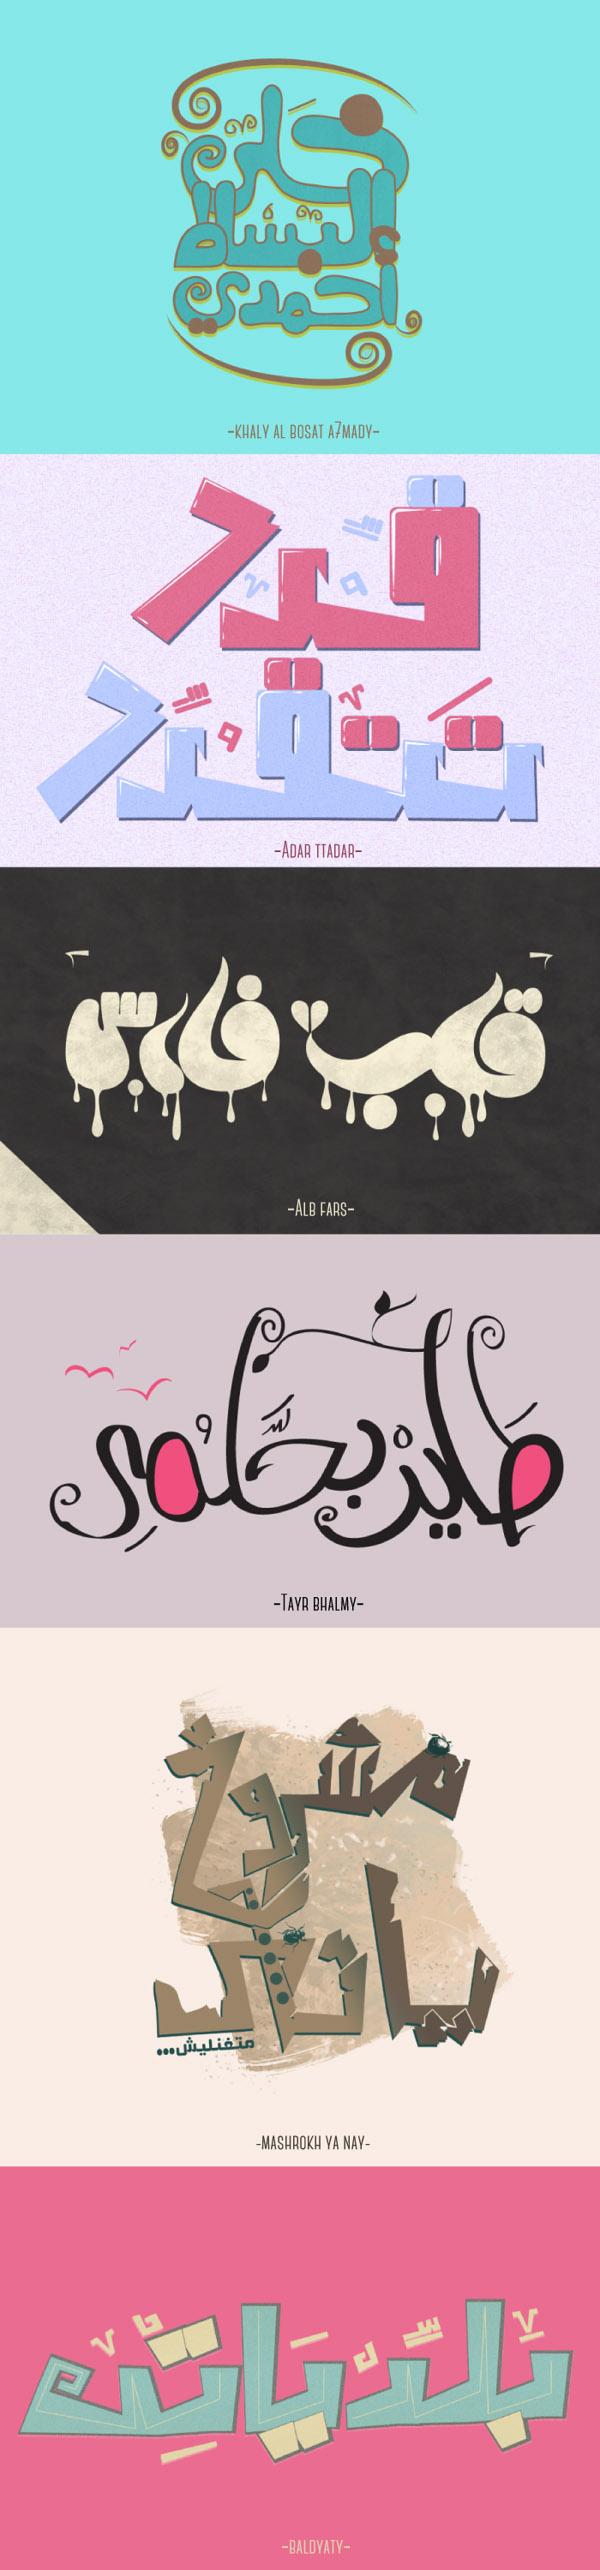 Arabic Typography Typography Inspiration #12